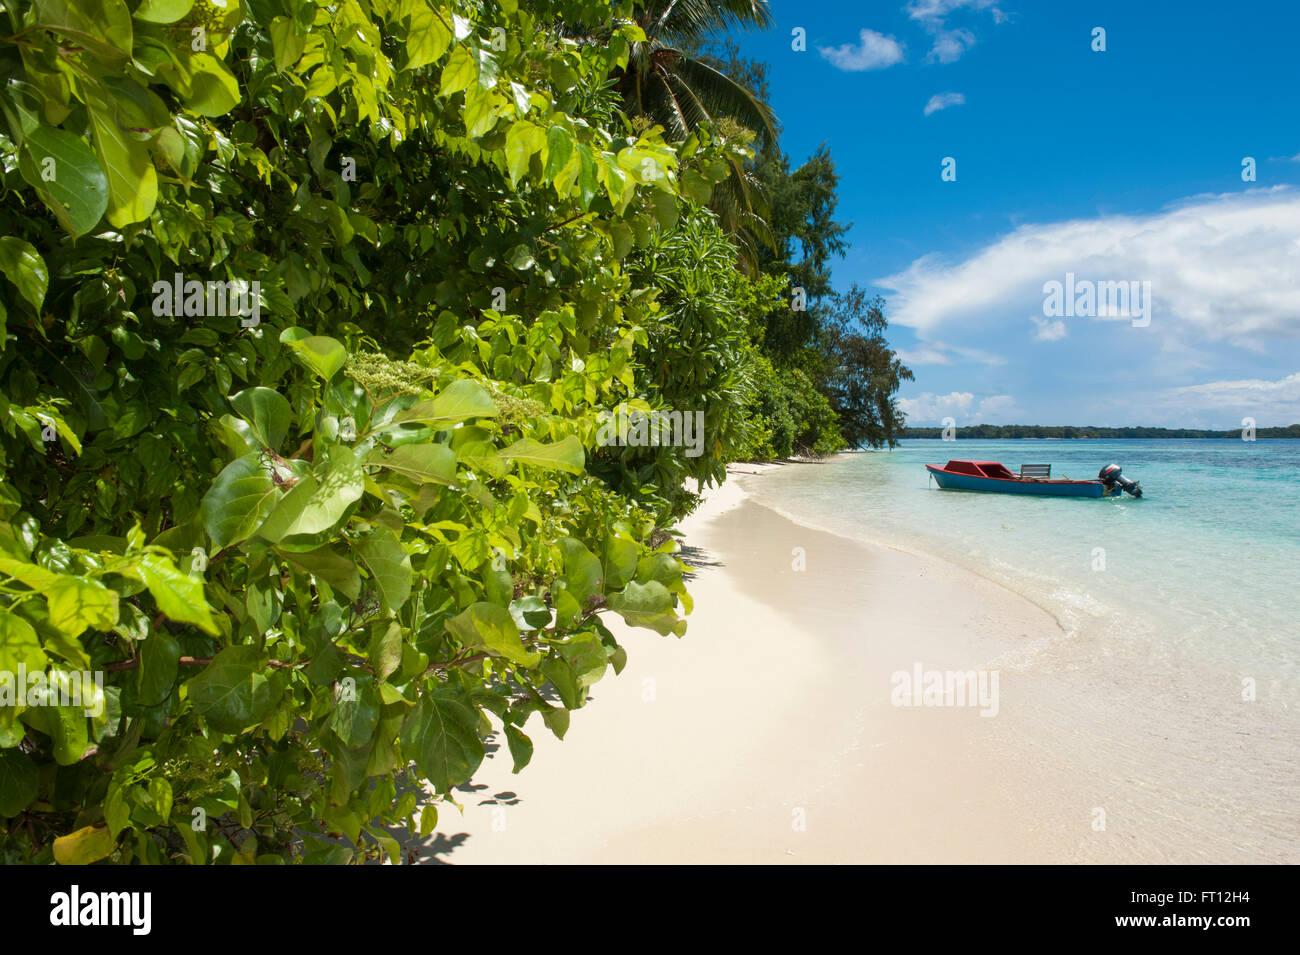 Fishing boat on a tropical beach, Onua island, Makira Province, Solomon Islands, South Pacific - Stock Image